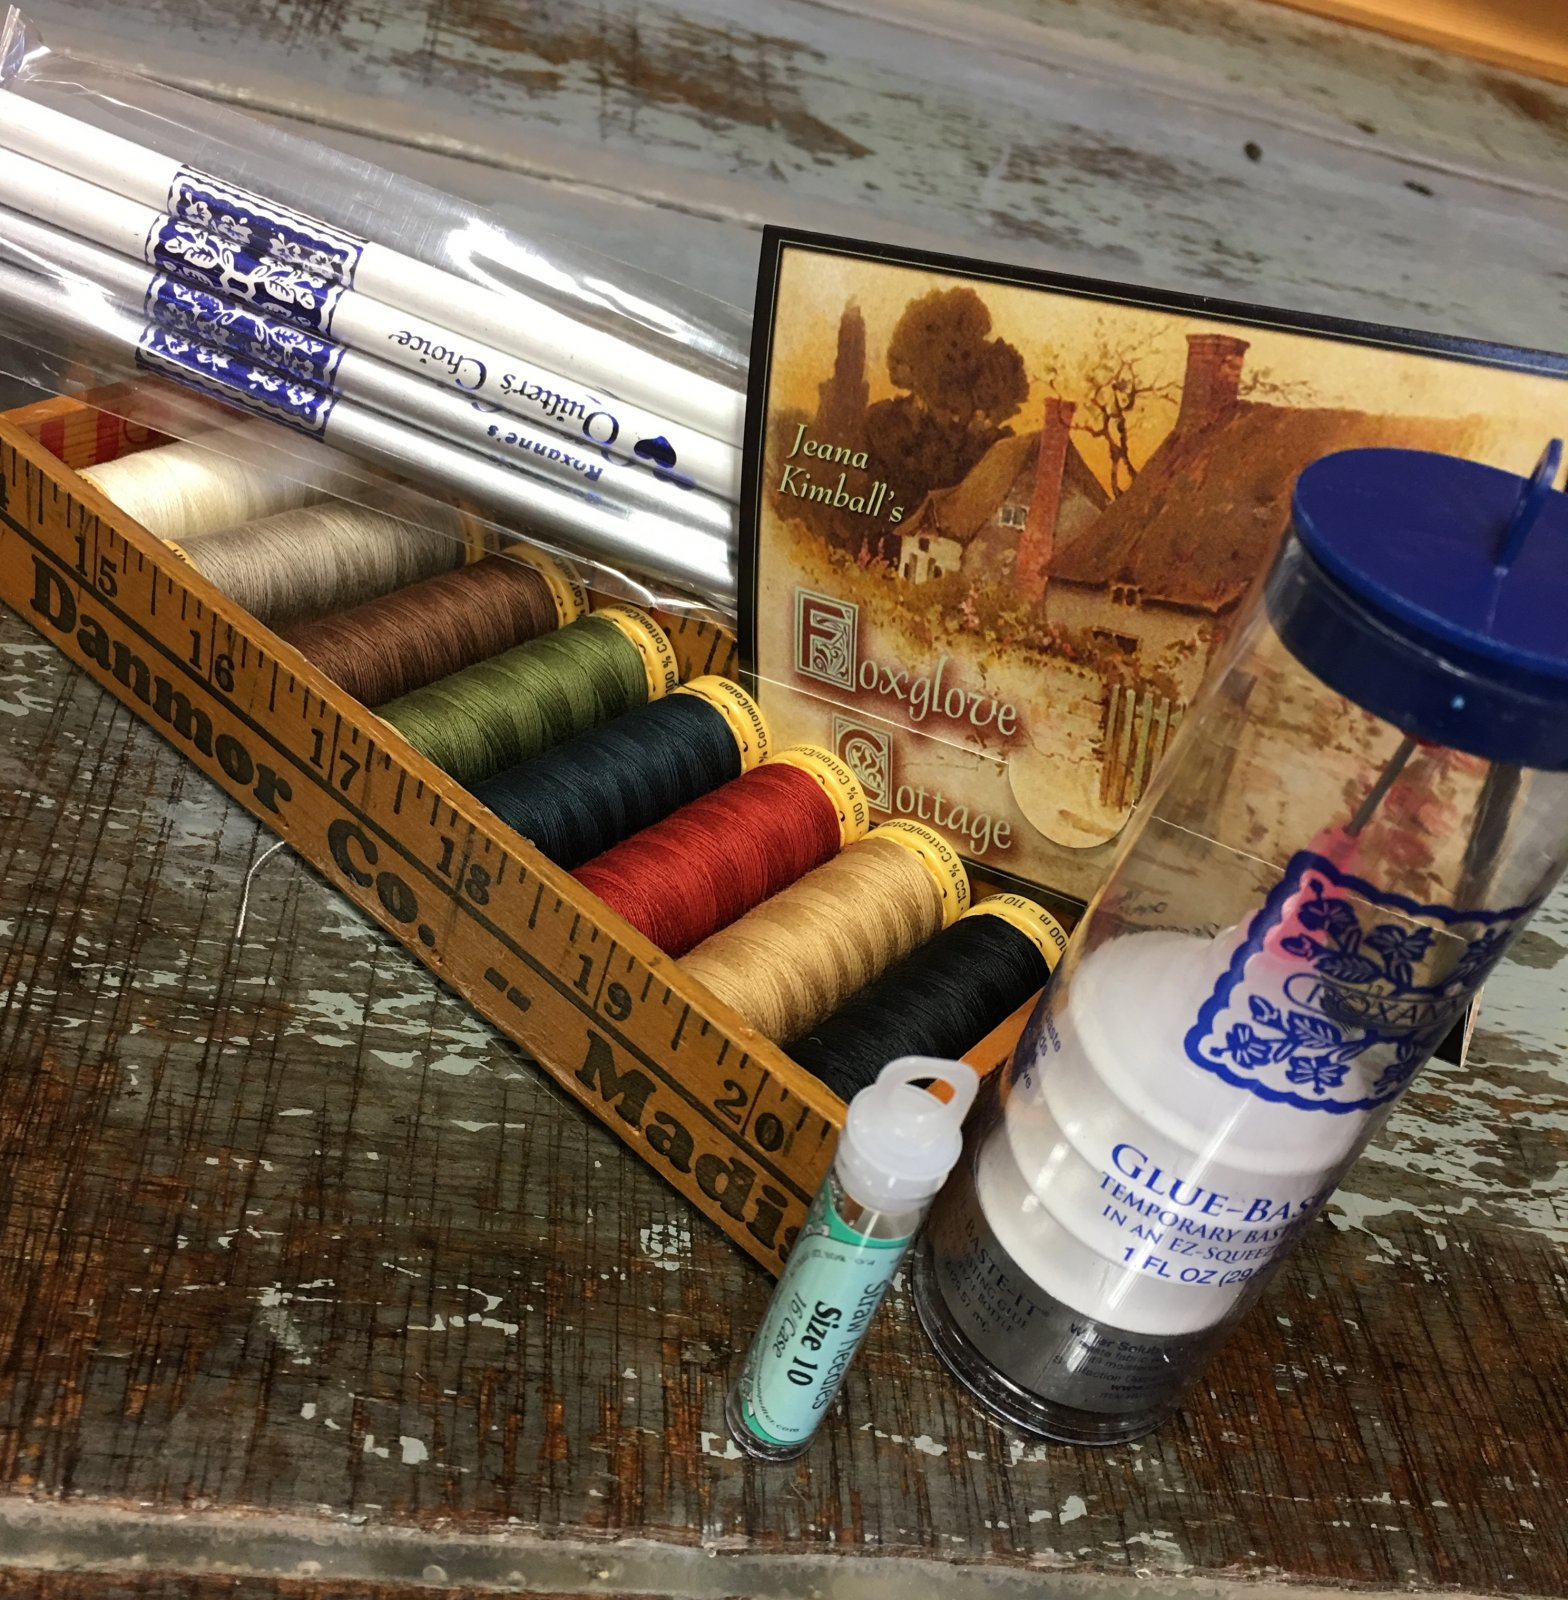 Applique Starter Kit with straw needles